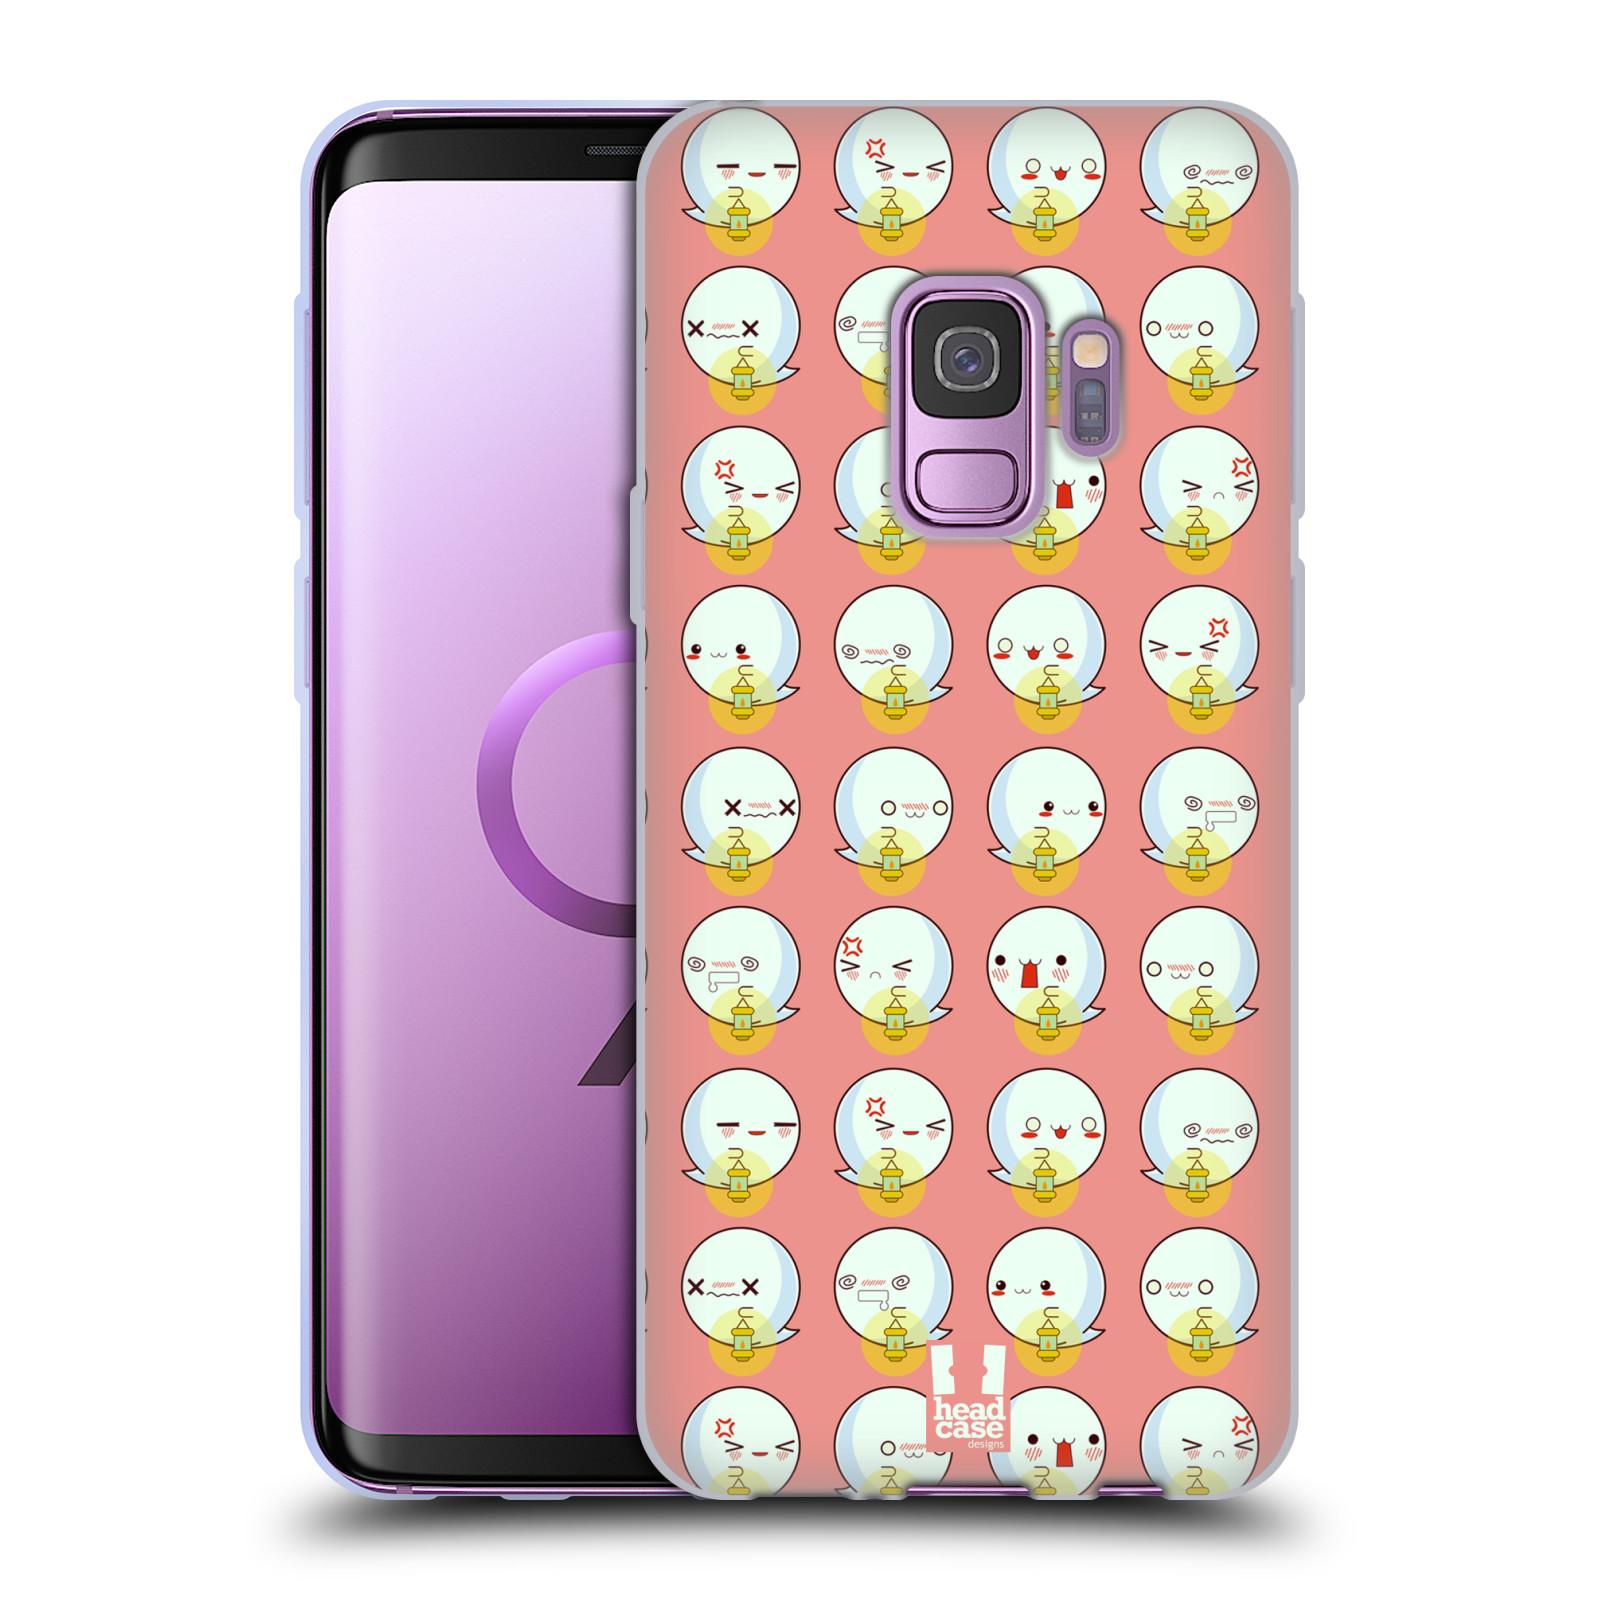 HEAD-CASE-DESIGNS-HALLOWEEN-KAWAII-SOFT-GEL-CASE-FOR-SAMSUNG-PHONES-1